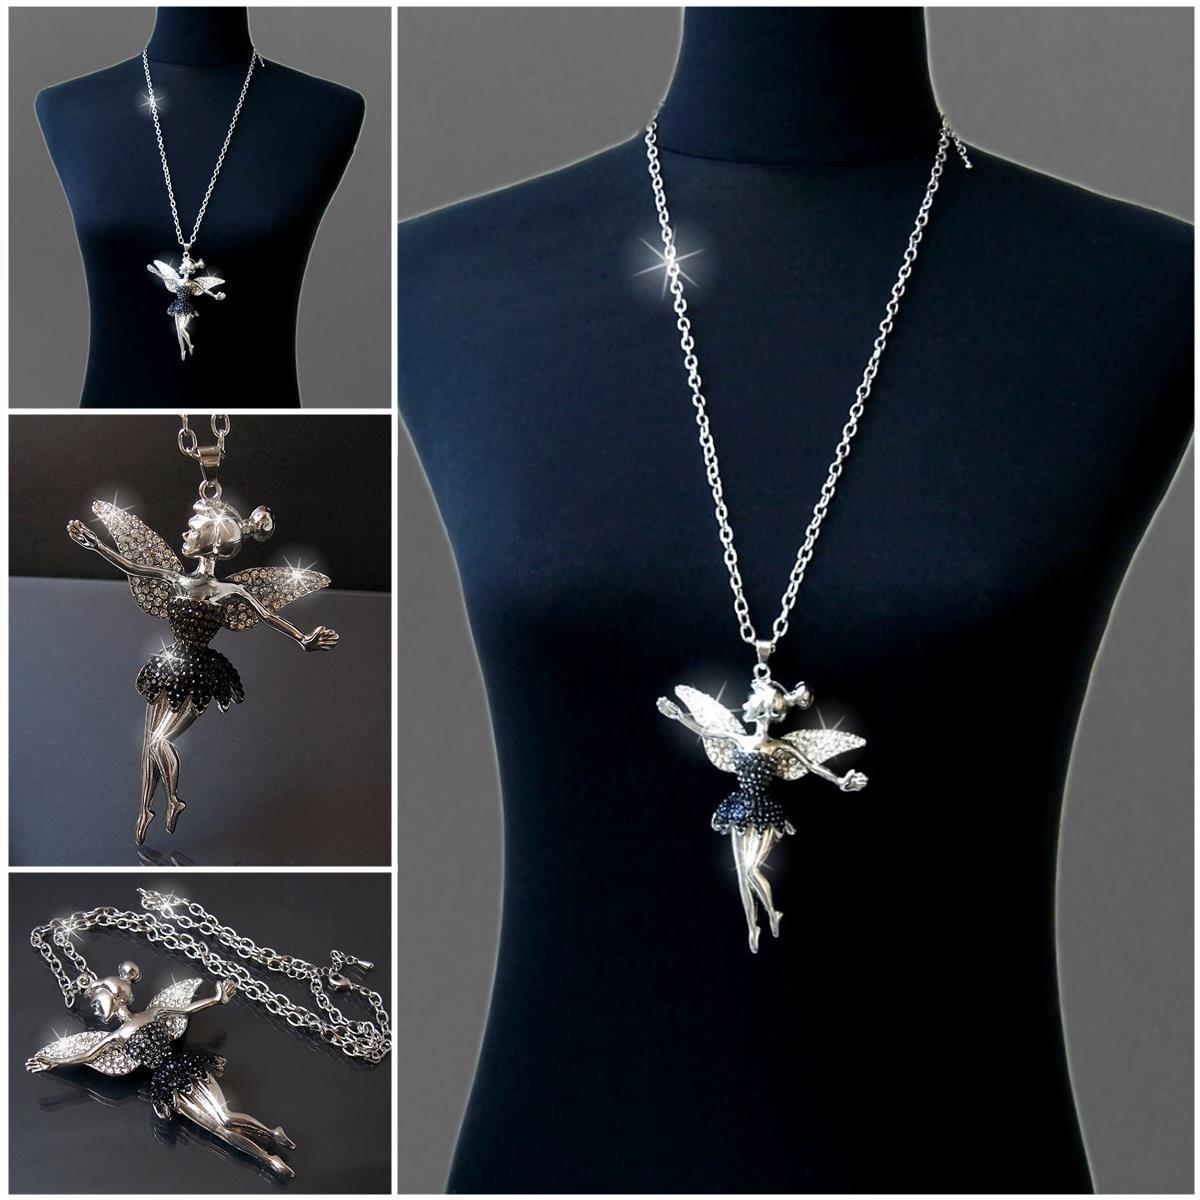 Lange Halskette Kette Silber Gold mit Anhänger Strass